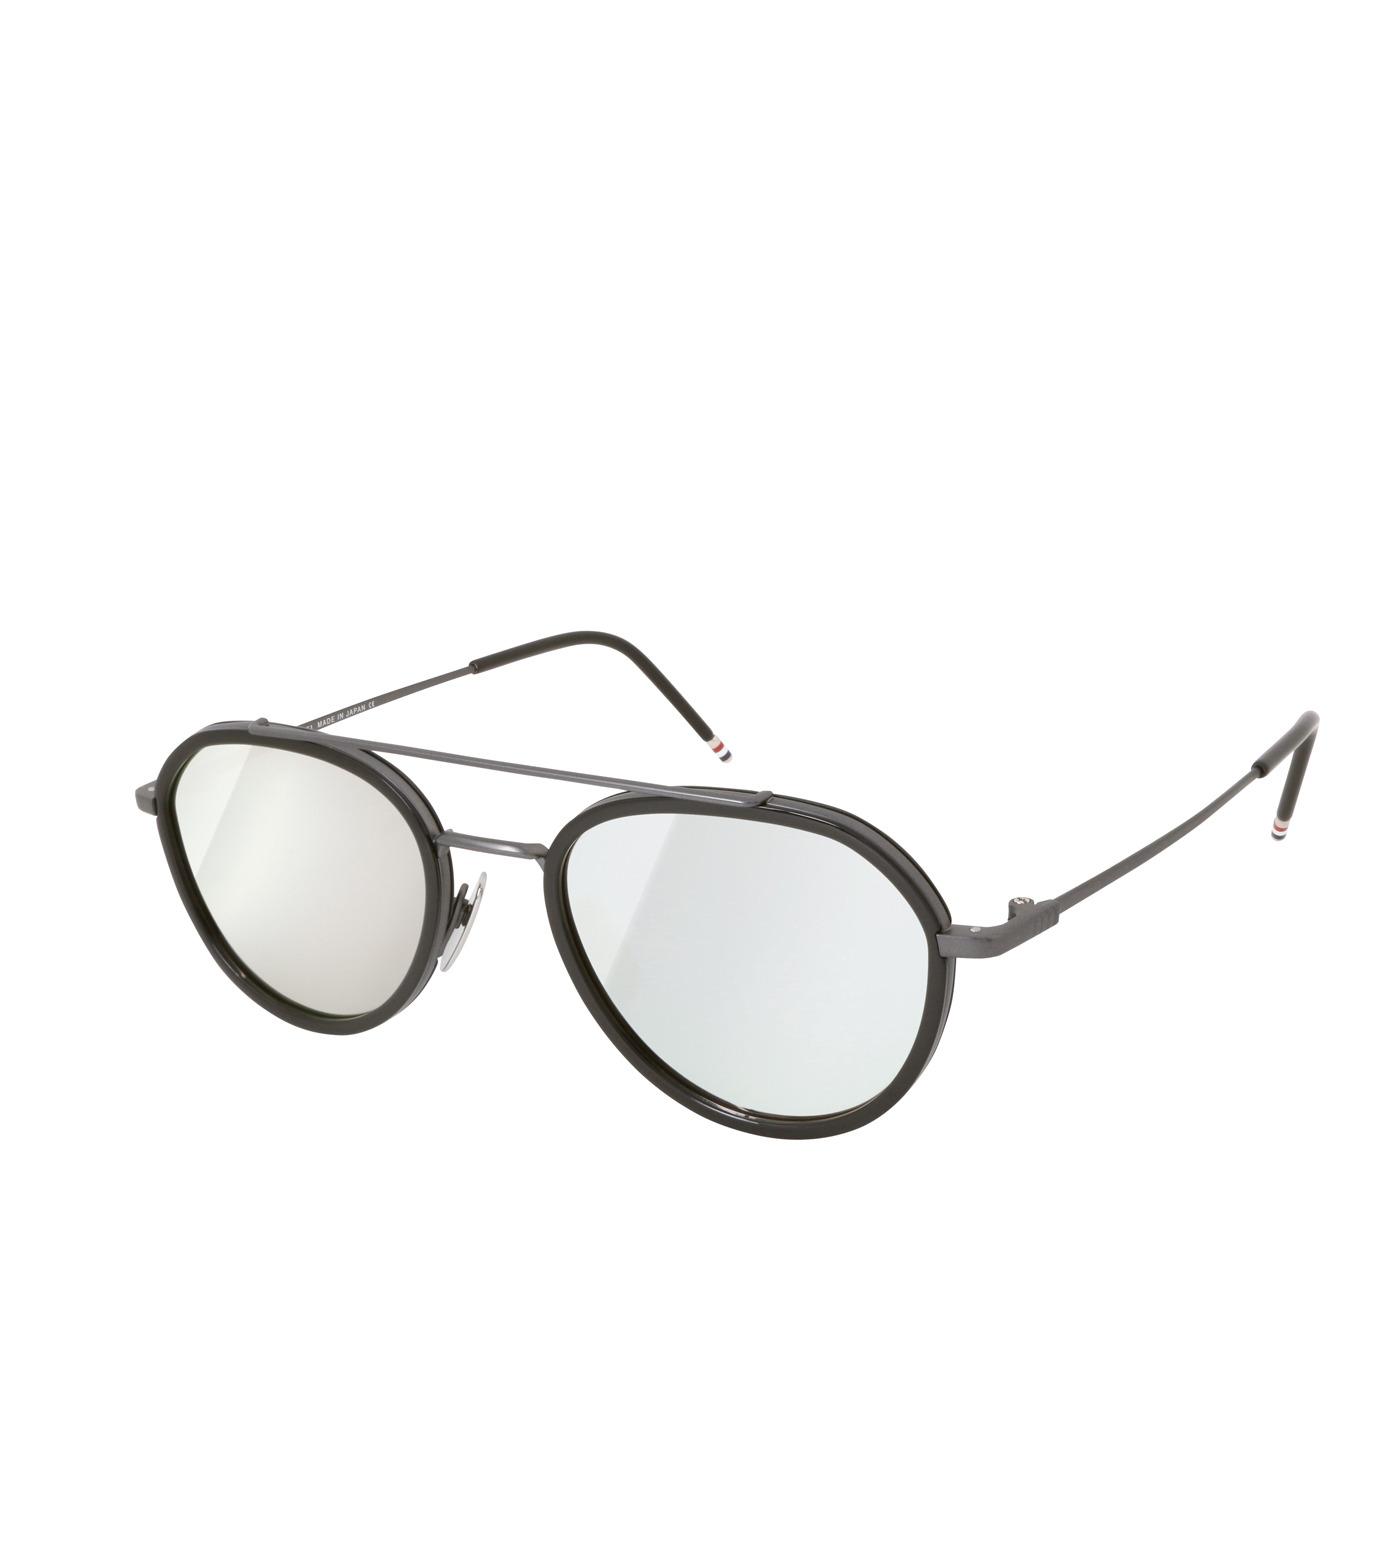 Thom Browne Eye Wear(トム・ブラウン・アイウェア)のMirror Lens Teardrop-BLACK(アイウェア/eyewear)-TB-801-F-13 拡大詳細画像1